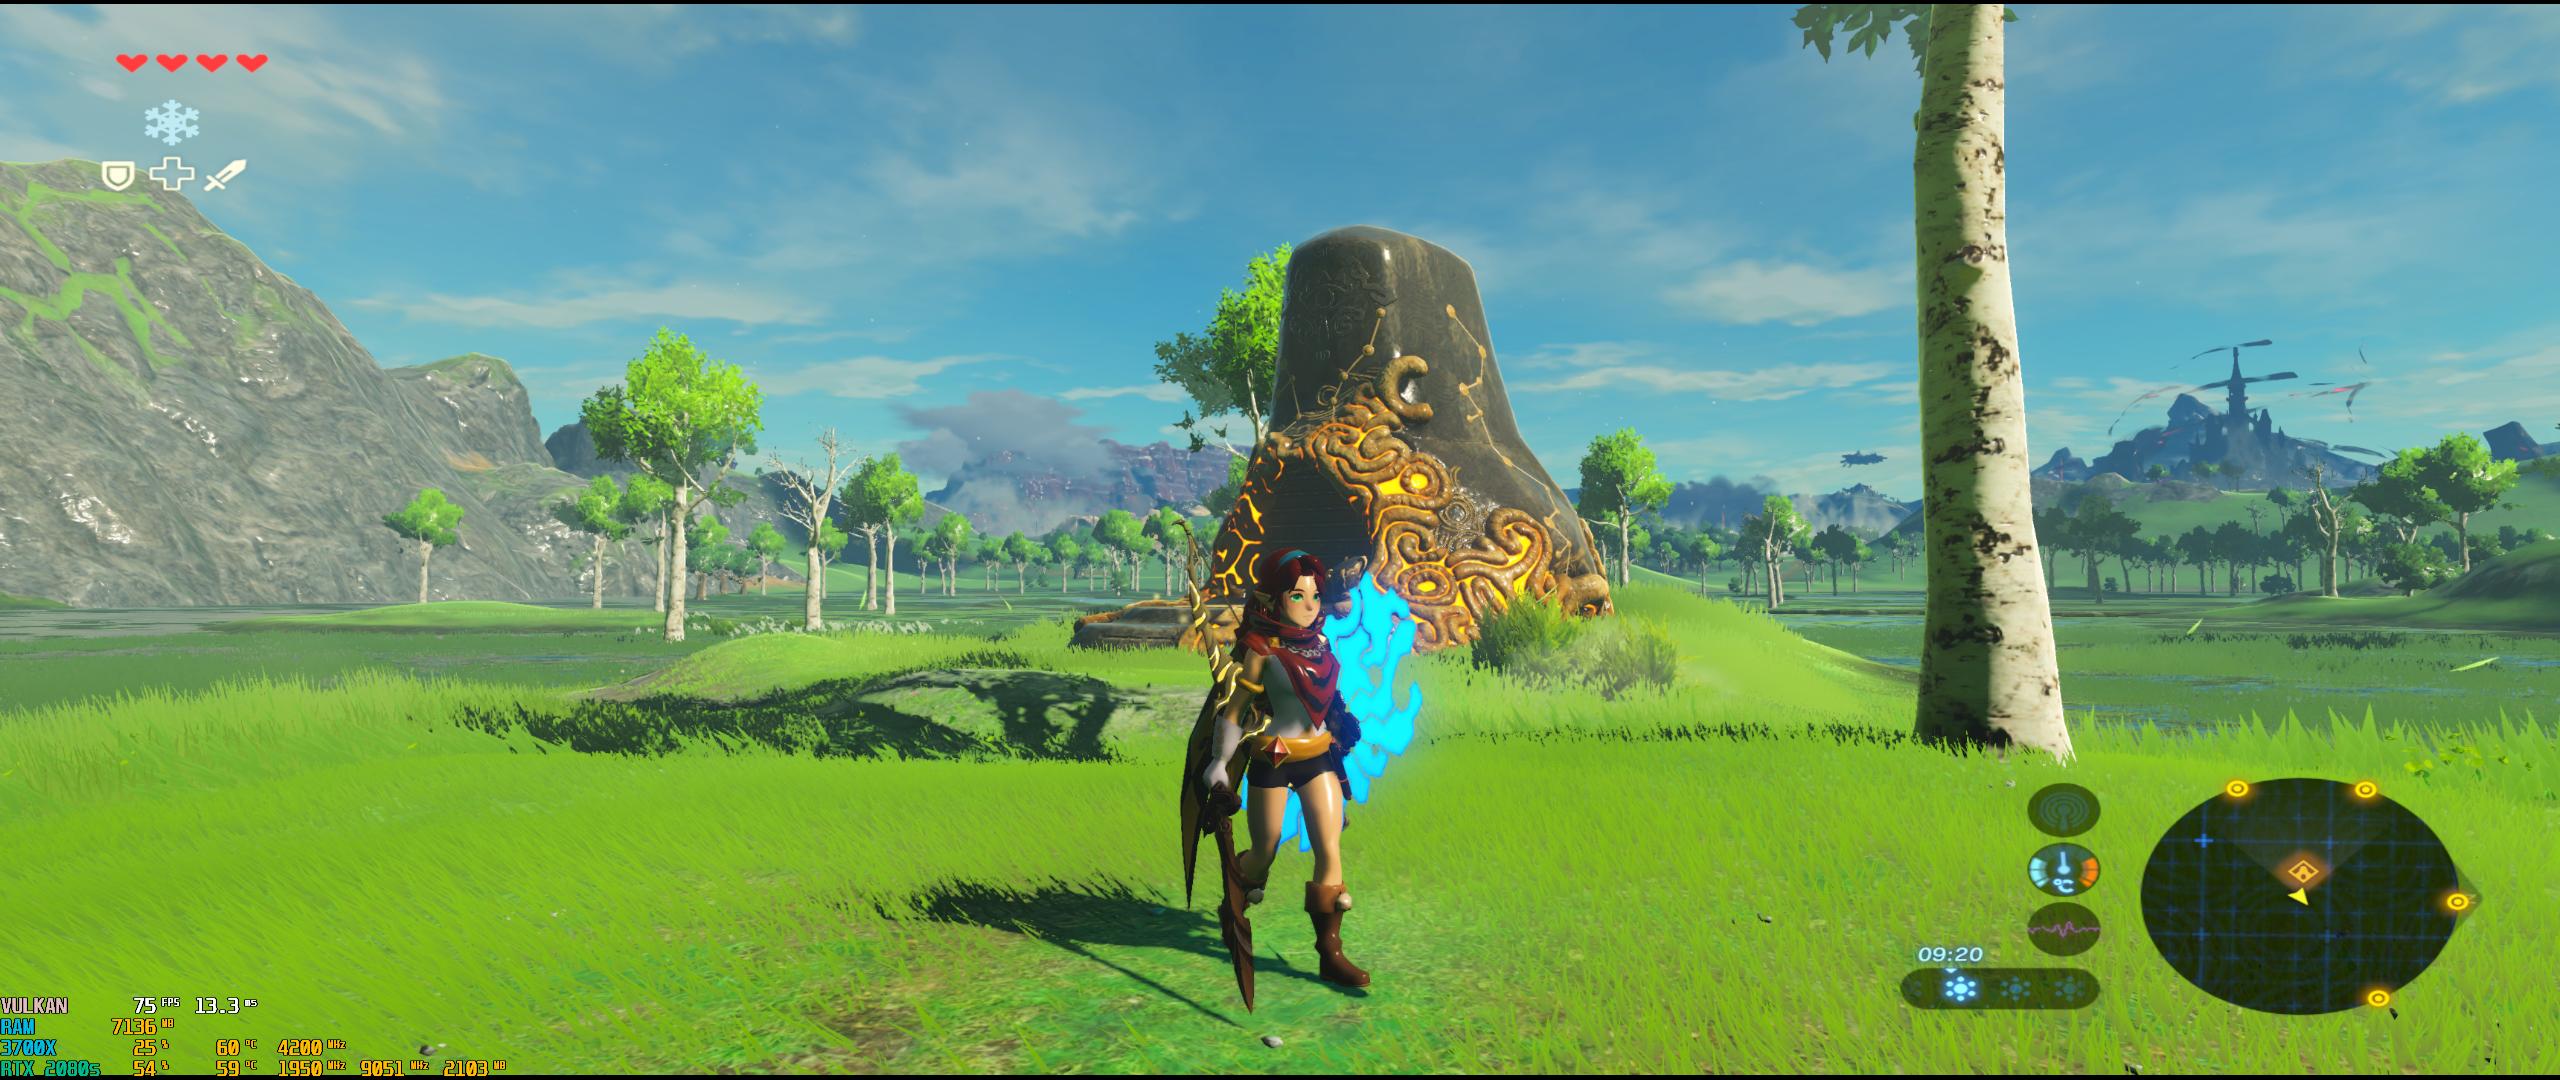 CEMU Screenshot 2020.02.13 - 22.35.53.43.png - The Legend of Zelda: Breath of the Wild